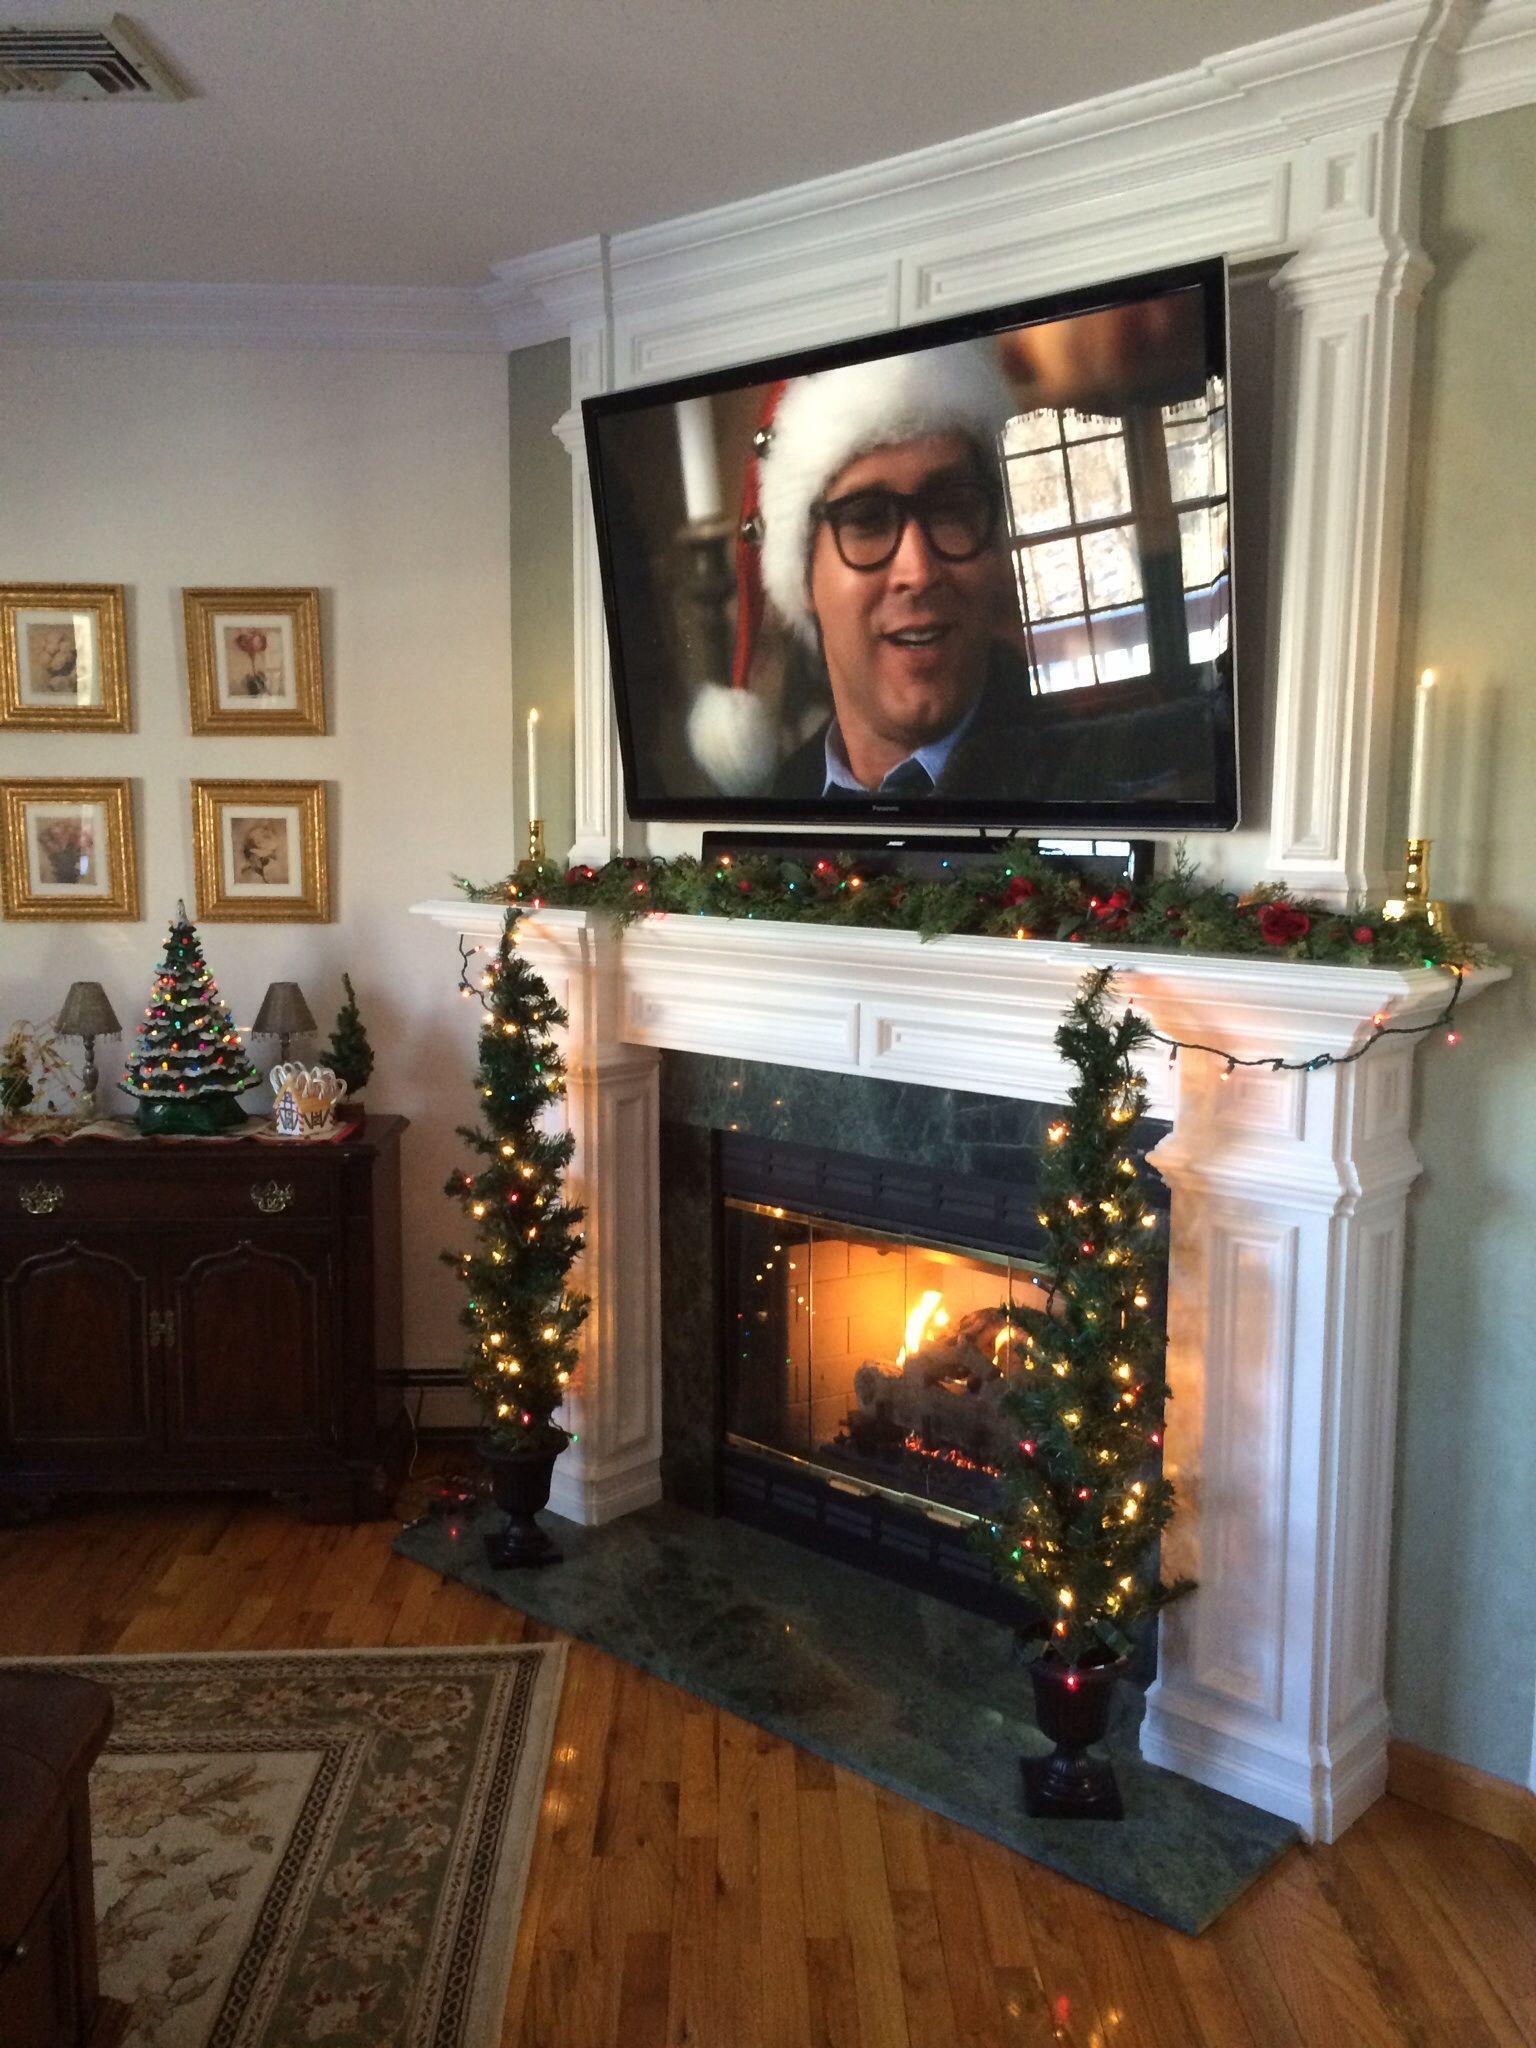 42 Christmas Fireplace Decor With Tv Ideas Christmas Fireplace